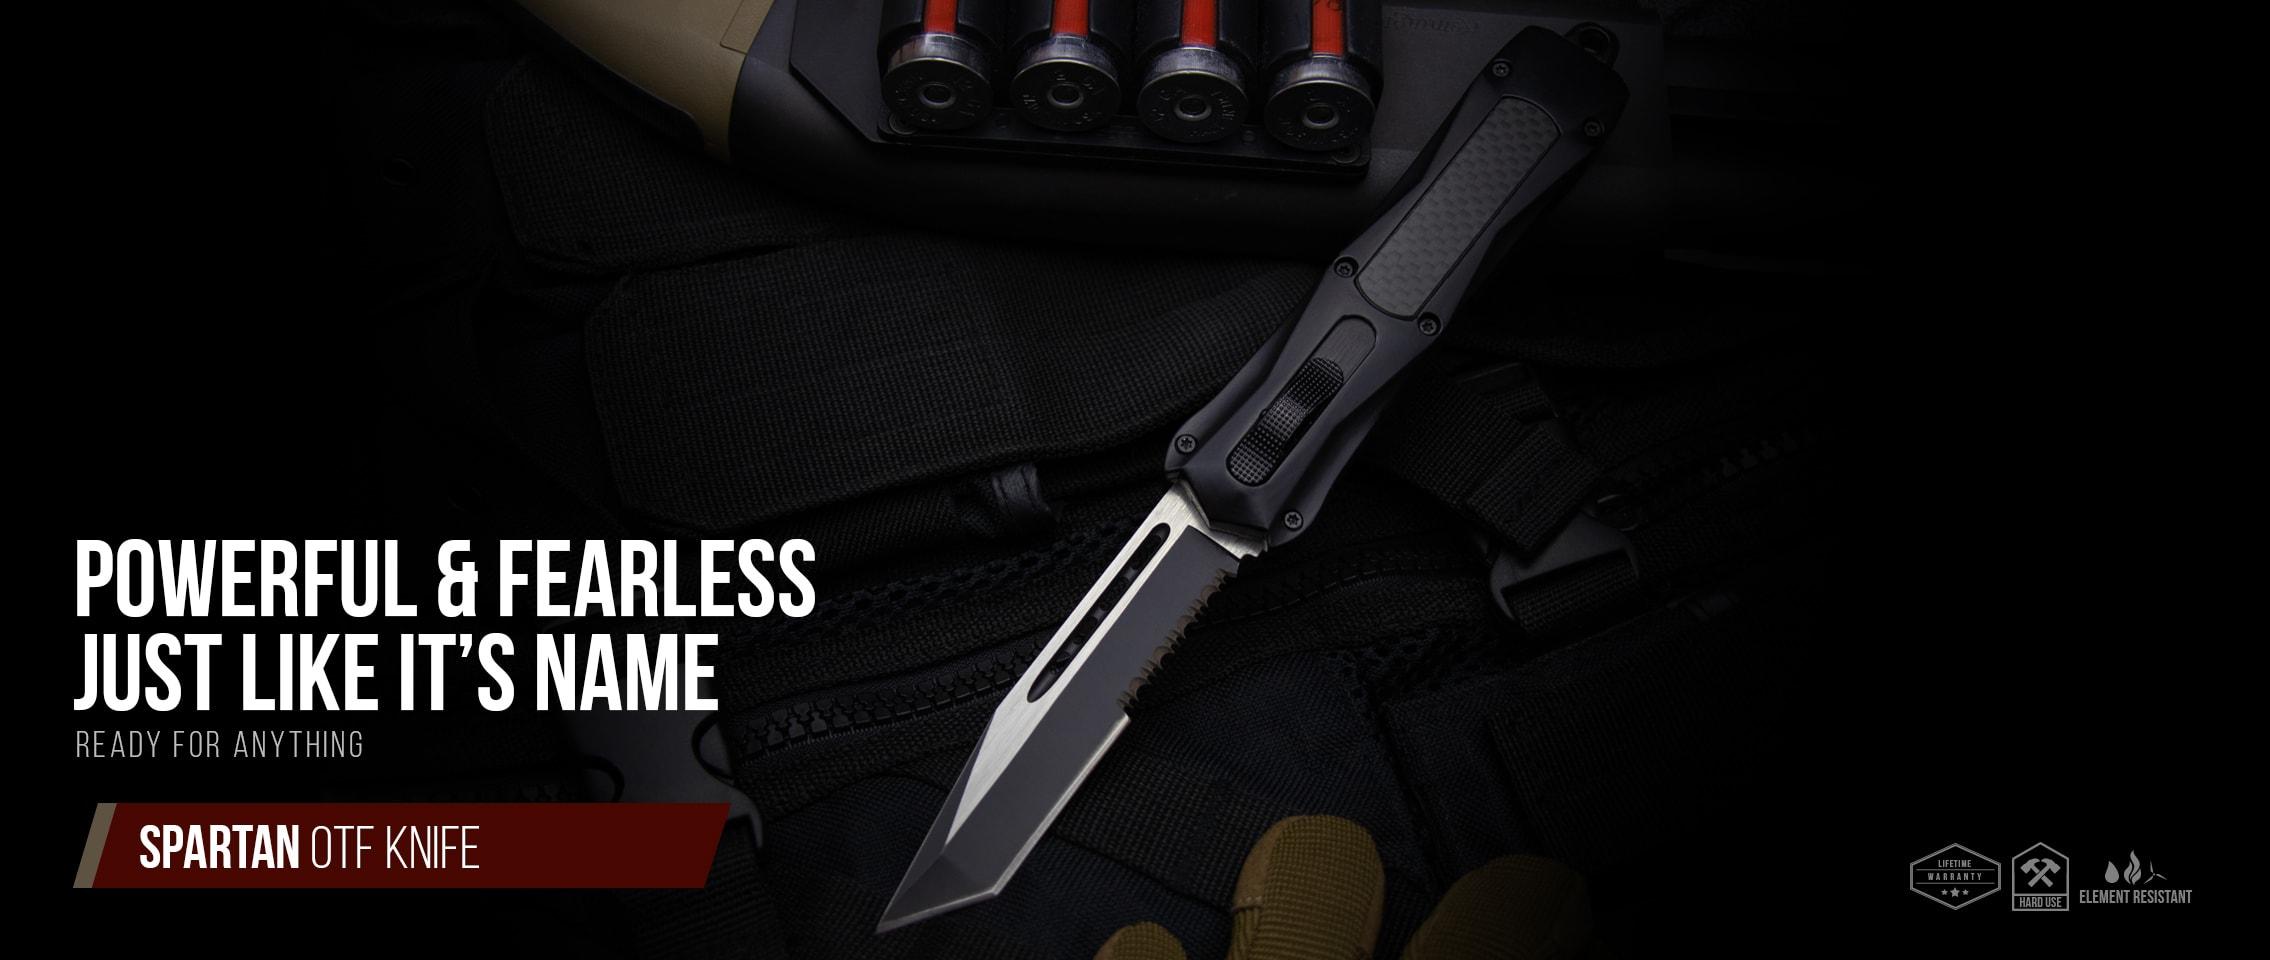 Spartan OTF Knife